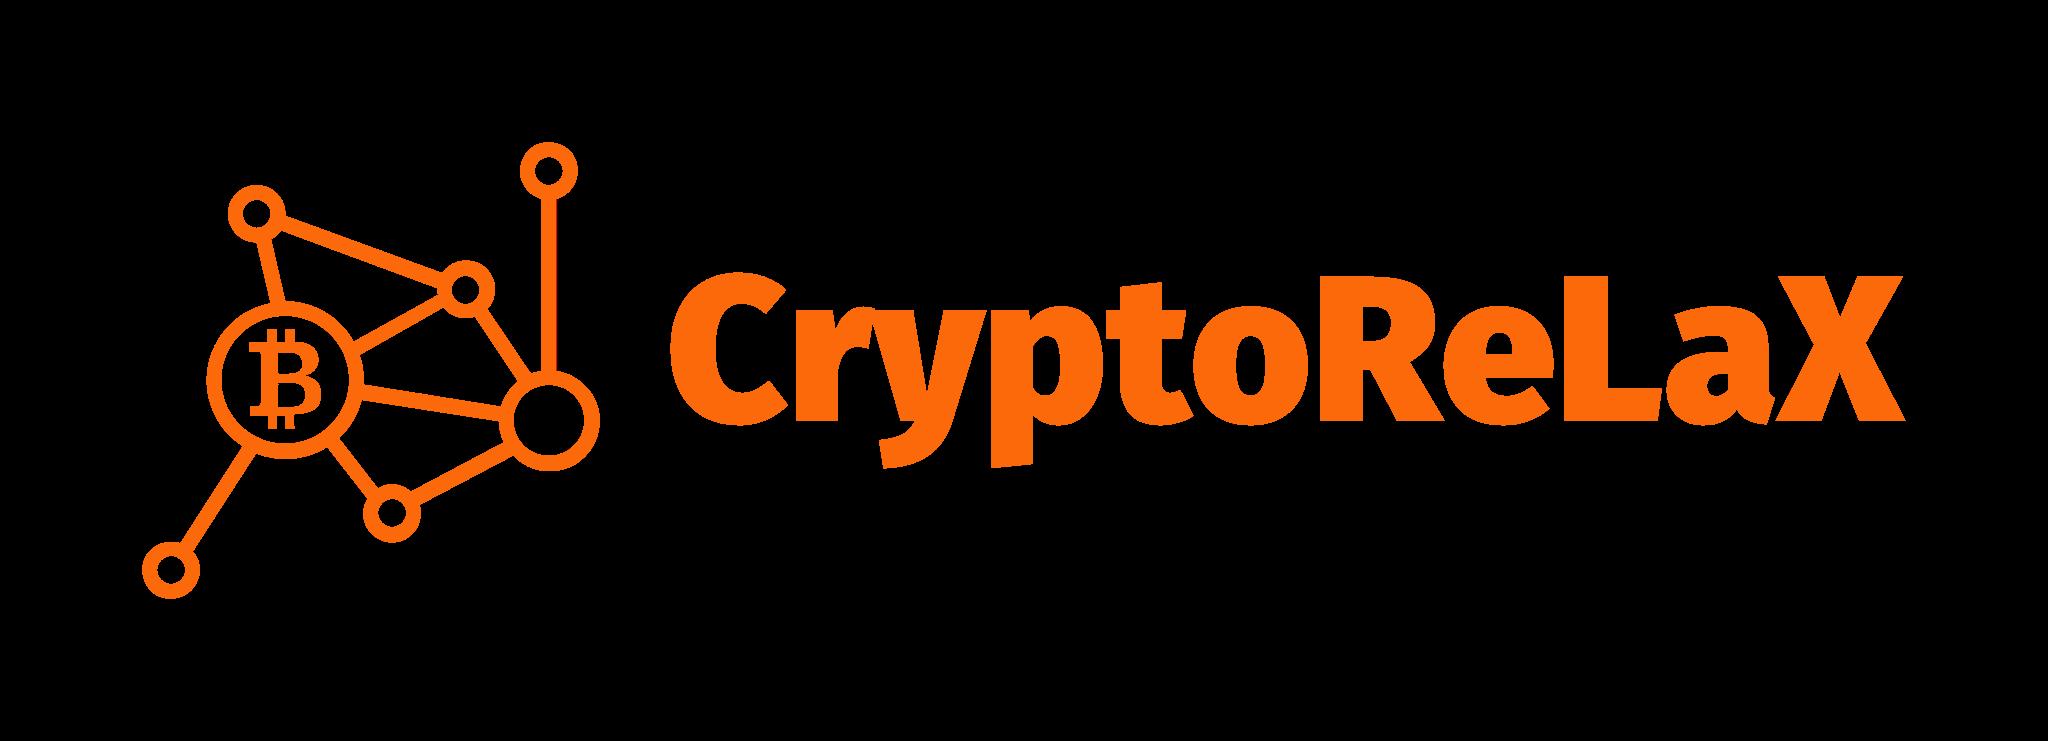 CryptoRelax